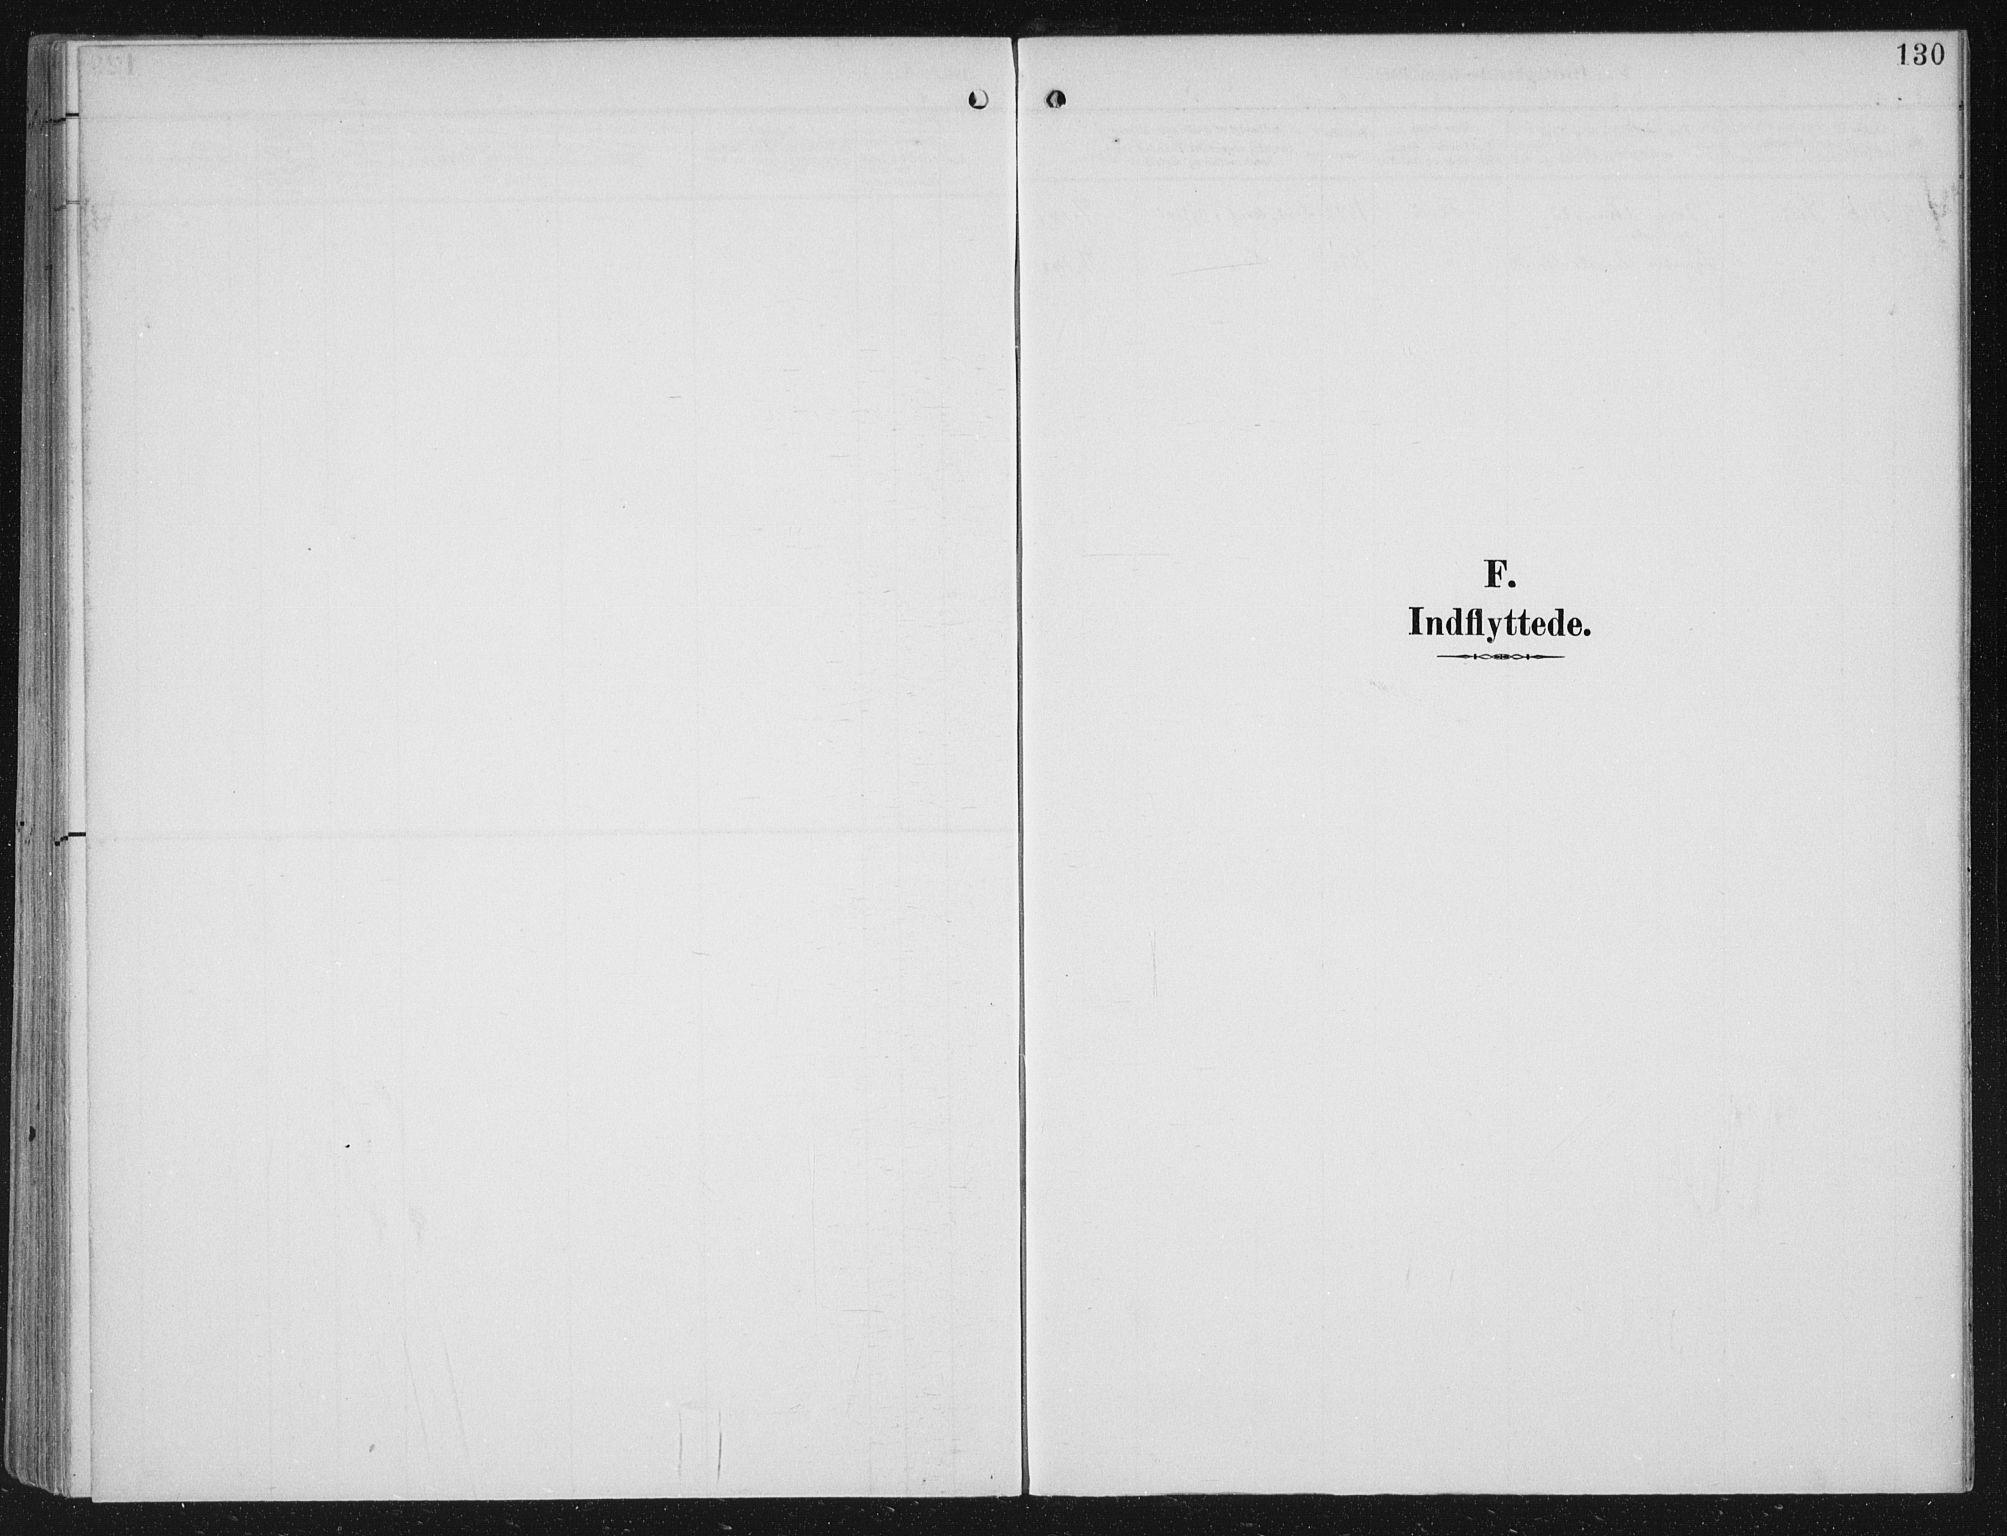 SAB, Kinn sokneprestembete, H/Haa/Haac/L0002: Ministerialbok nr. C  2, 1895-1916, s. 130